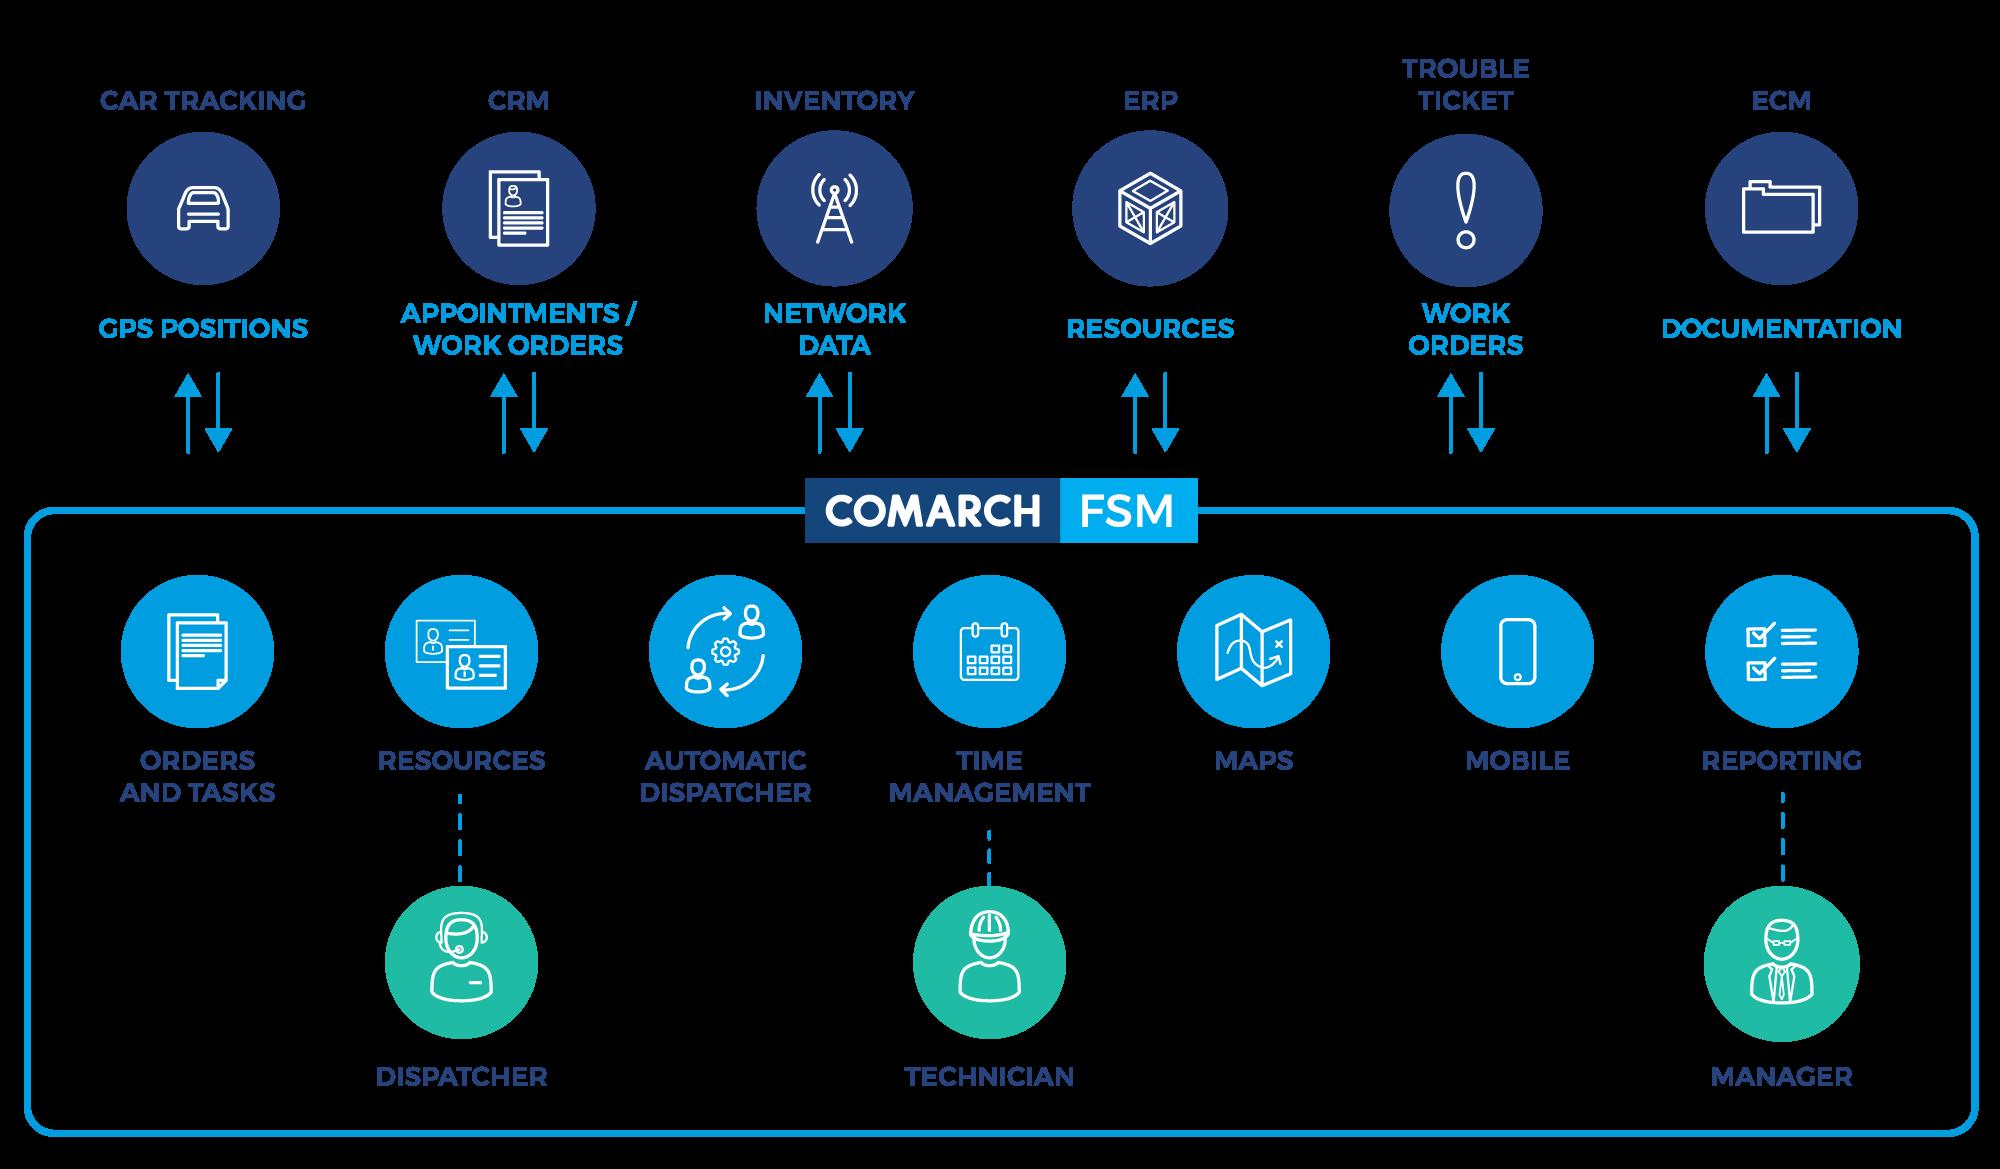 Field Service Management Software Solution Comarch Fsm